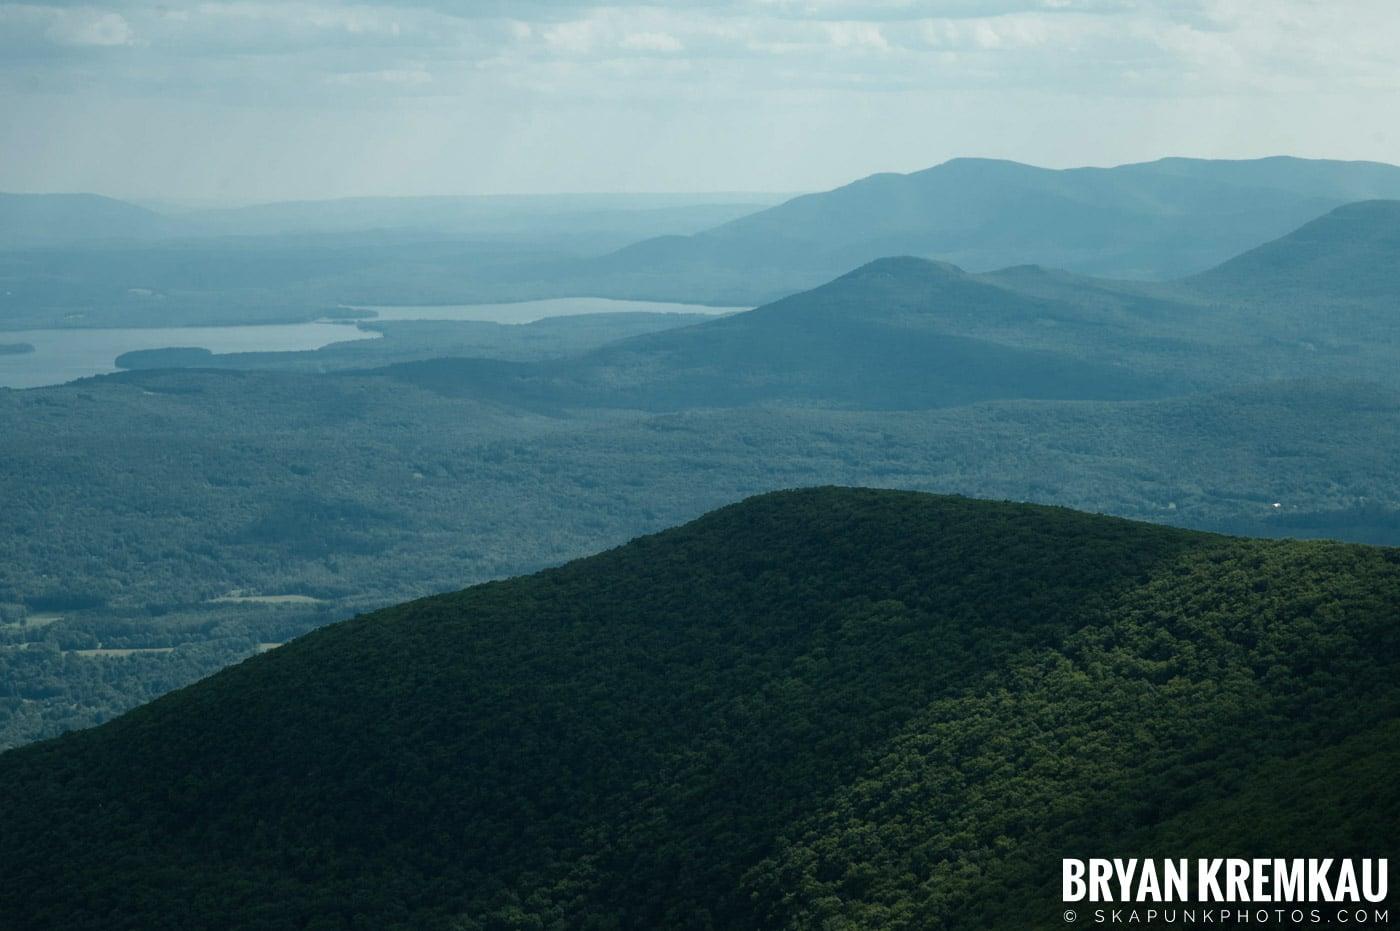 Catskills Overlook Mountain @ Woodstock, NY - 6.24.07 (3)